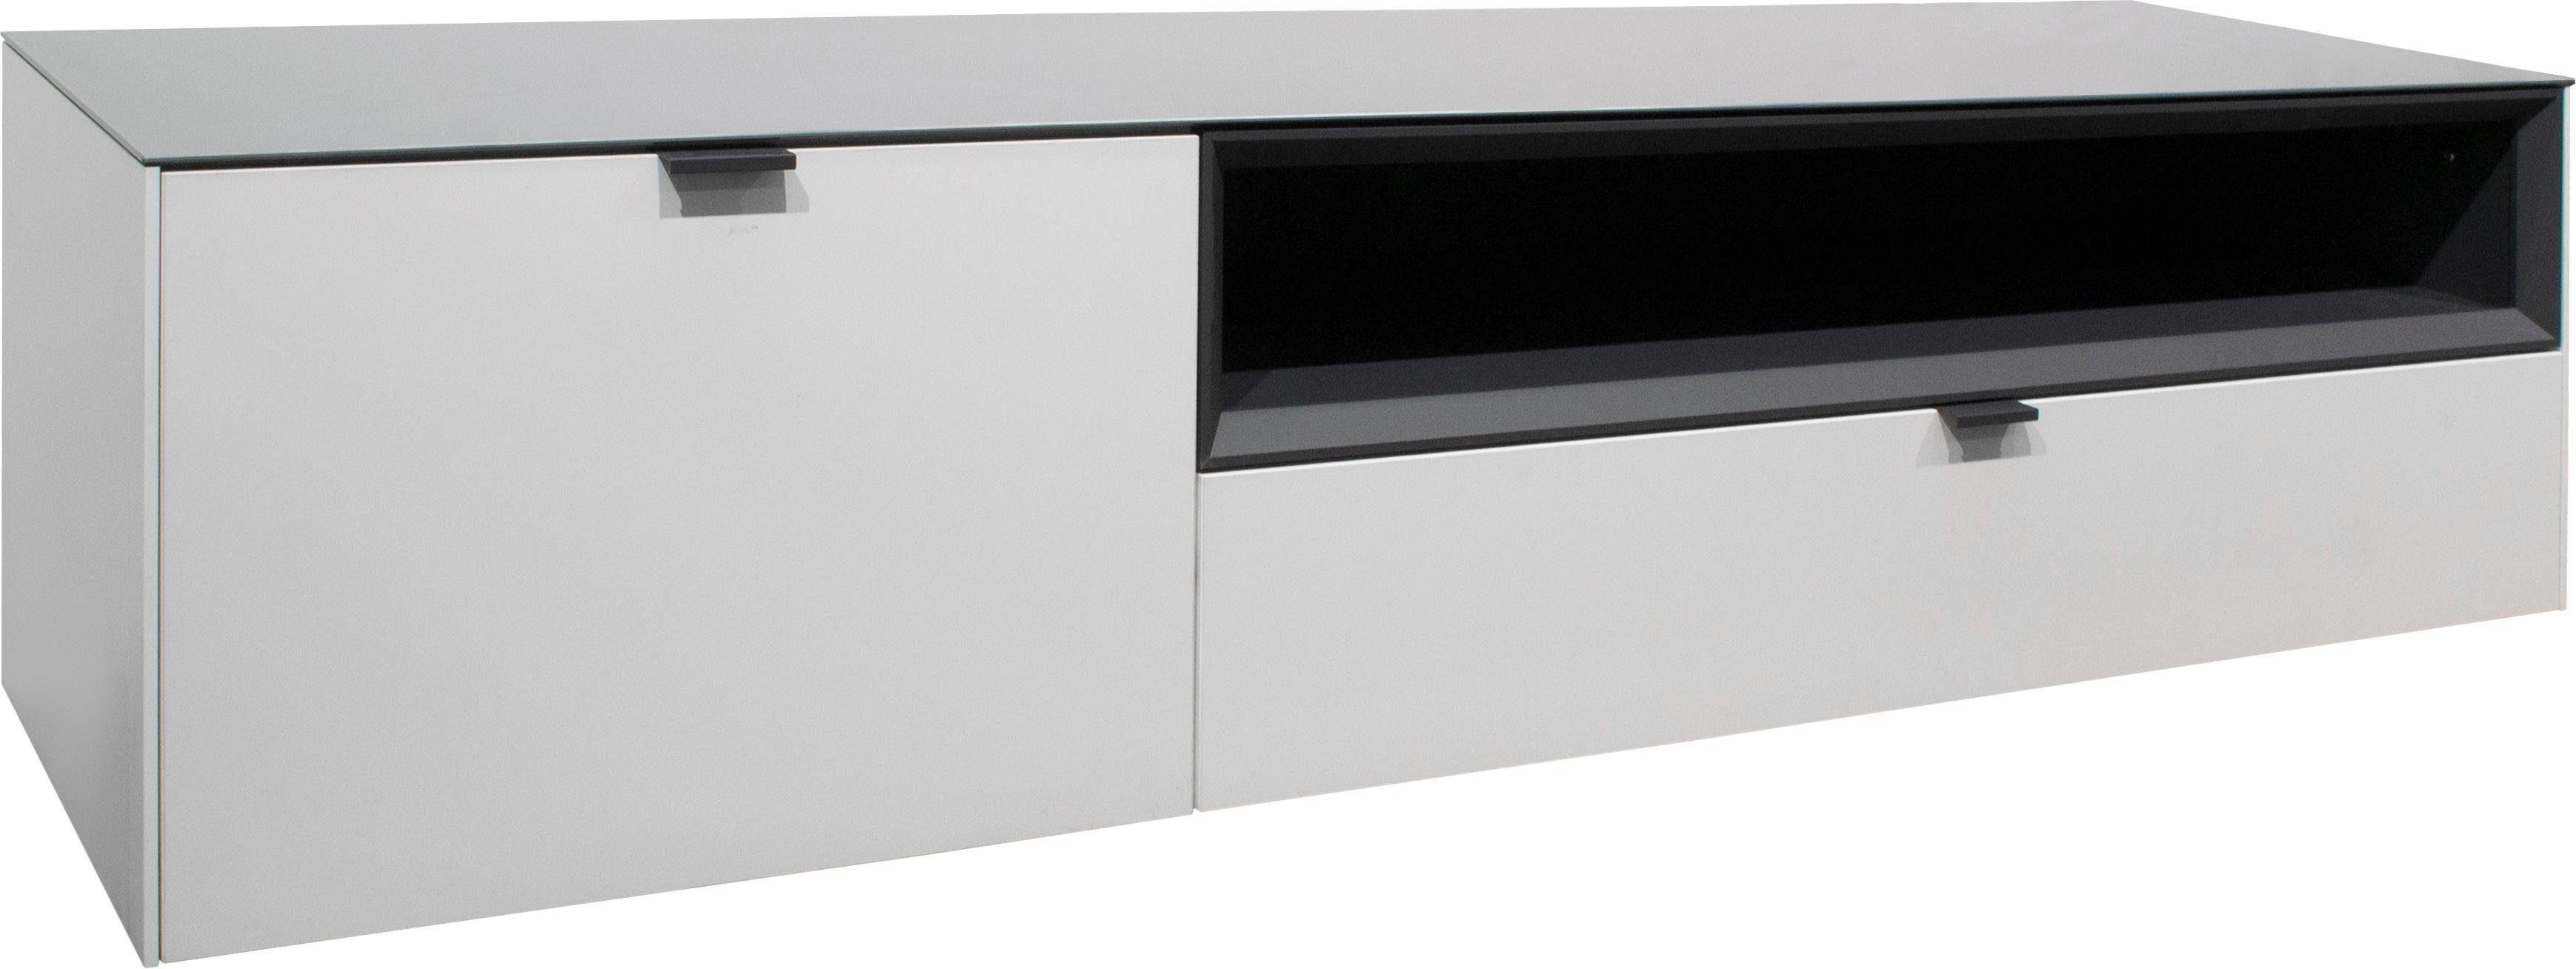 Lowboard »Micelli«, Breite 177 cm